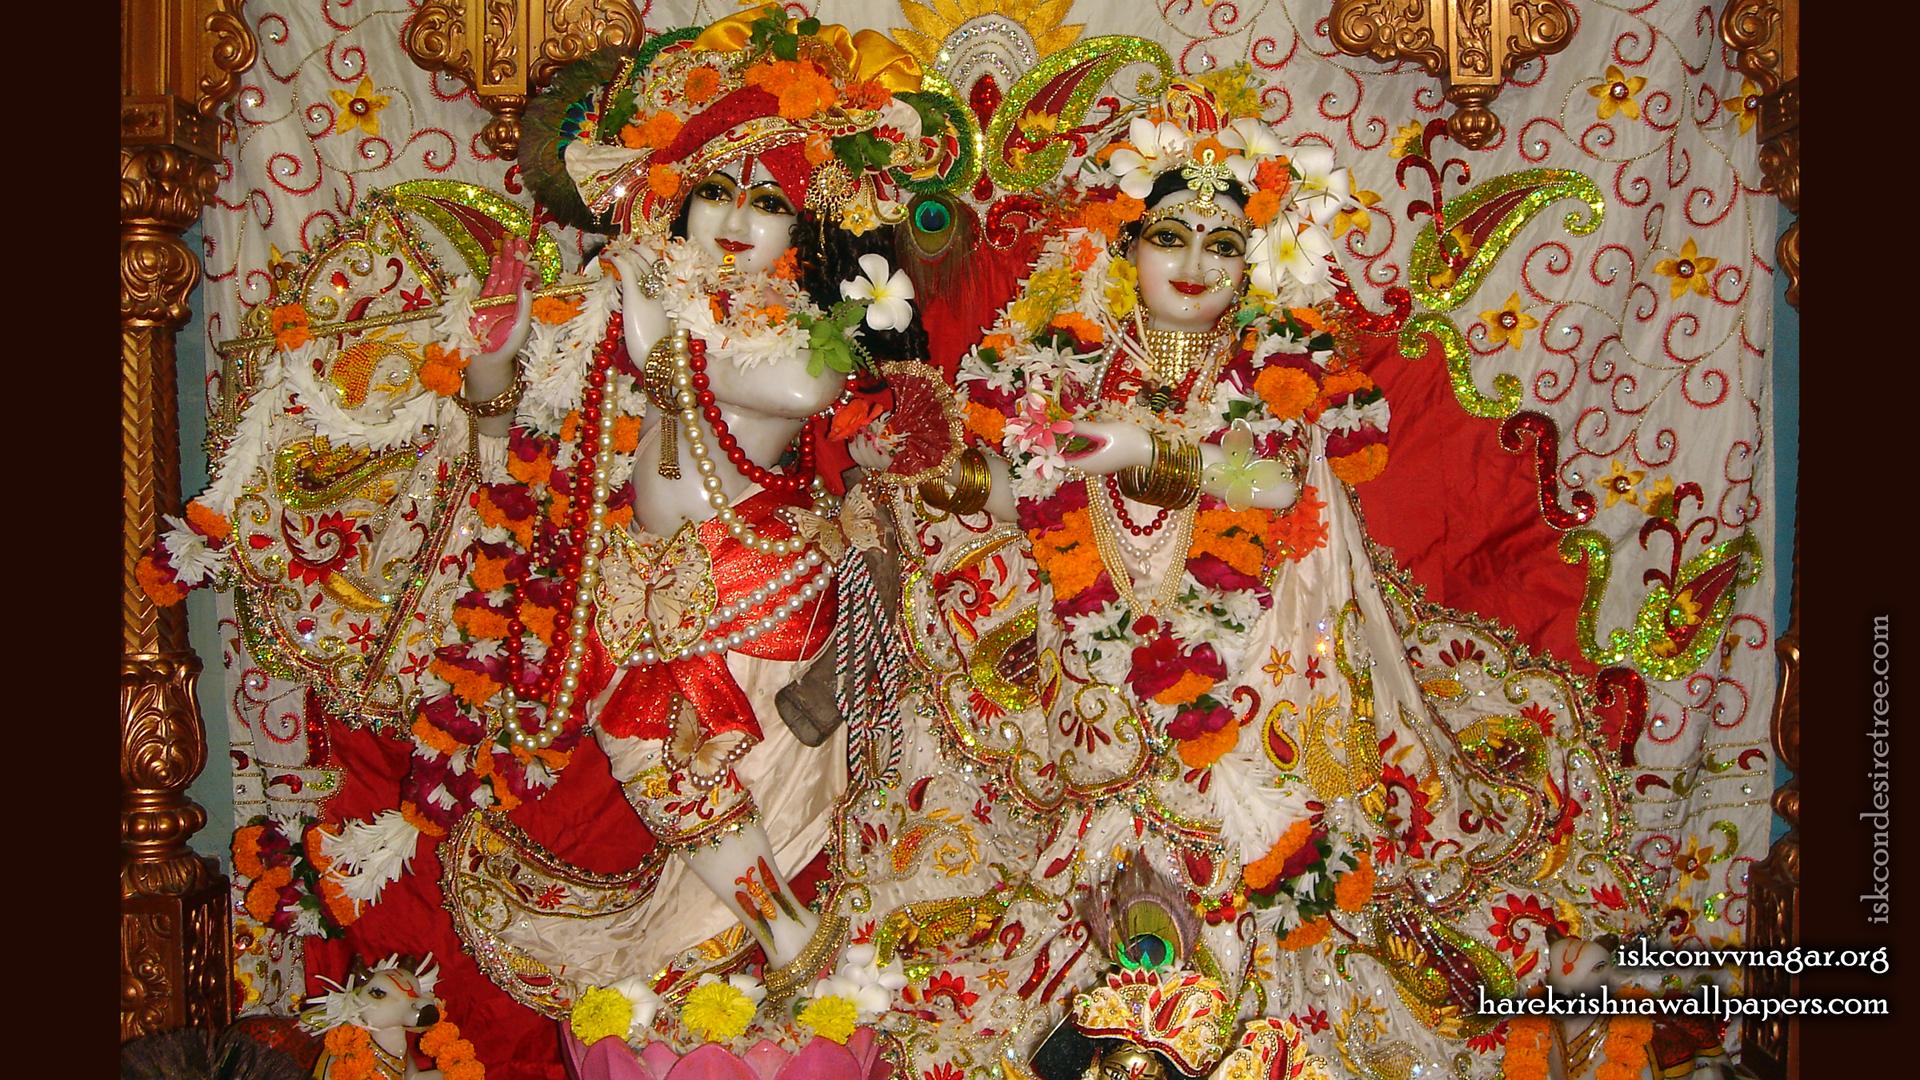 Sri Sri Radha Giridhari Wallpaper (025) Size 1920x1080 Download